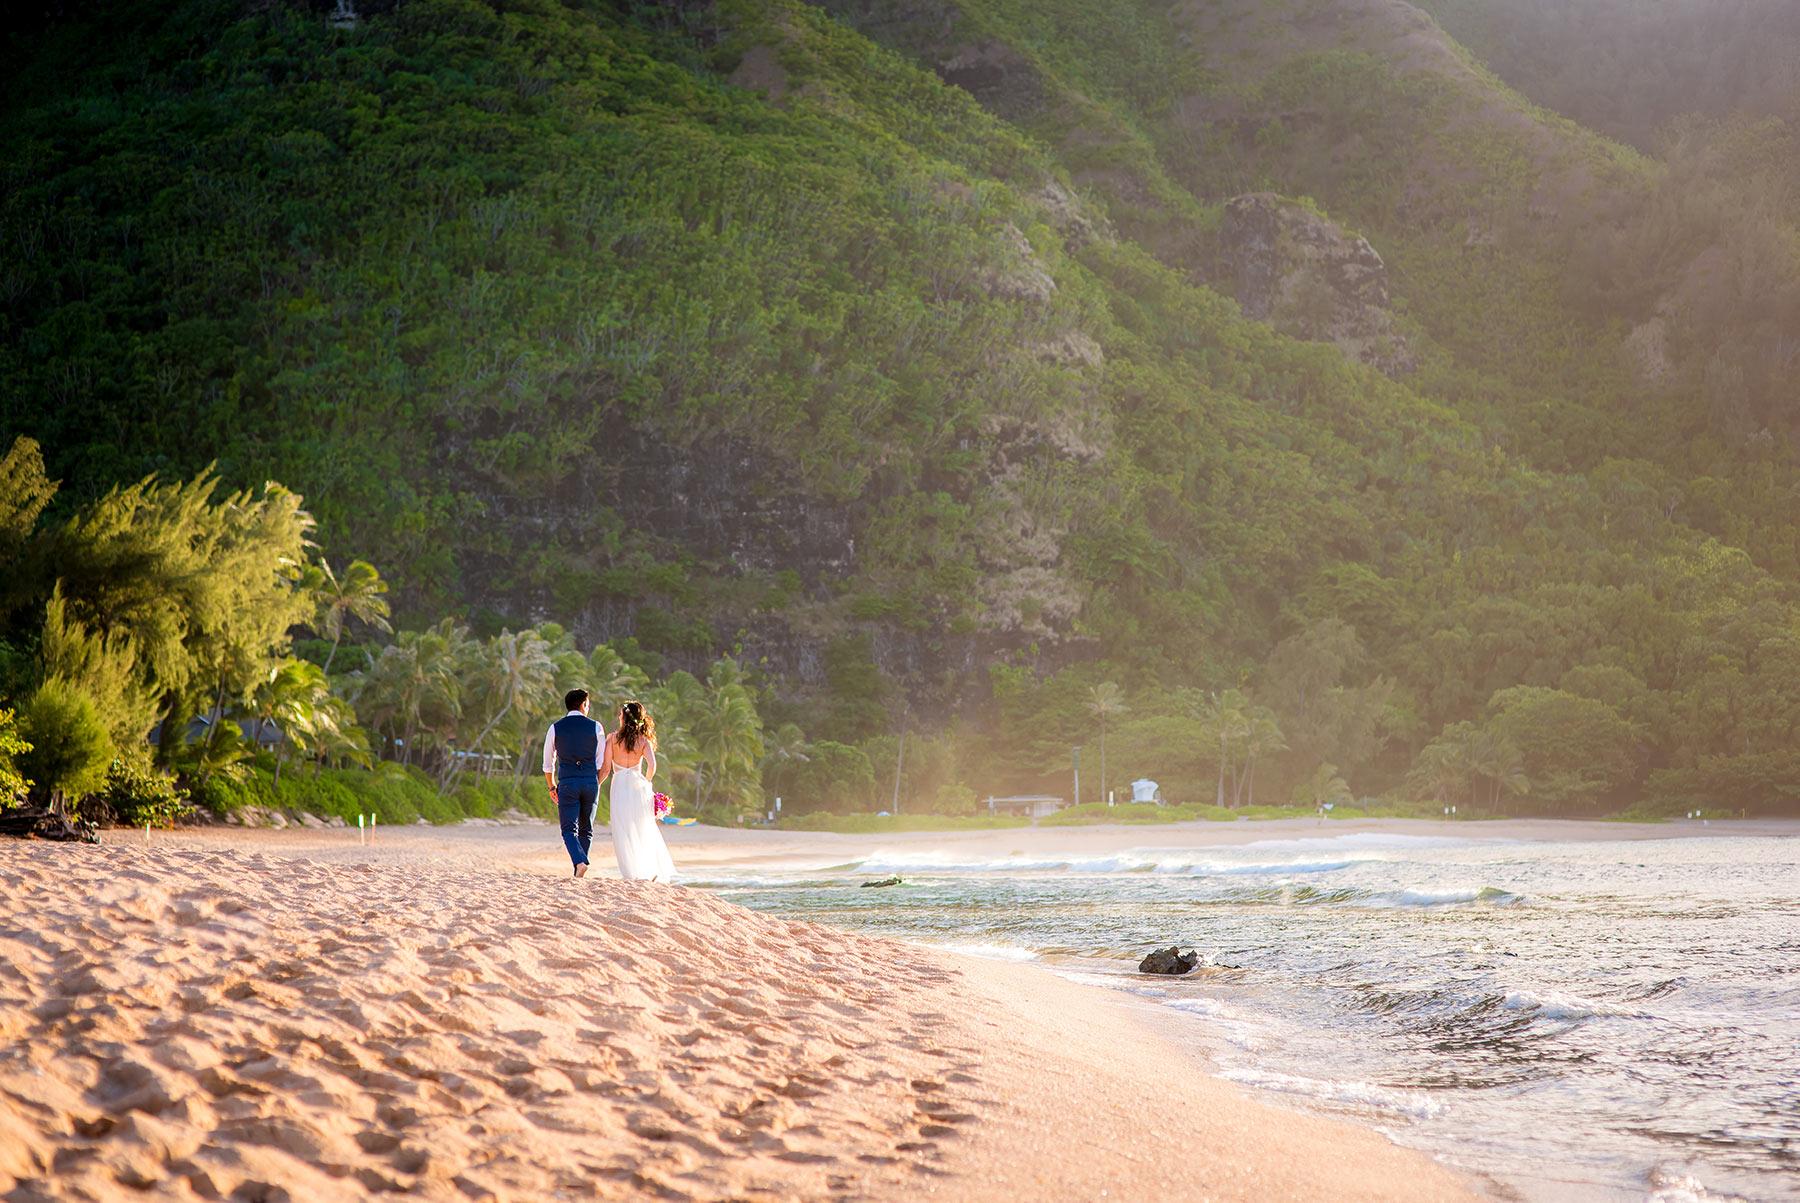 A couple walking off into the sunset at Kee beach, Kauai - on their perfect Hawaiian wedding day.